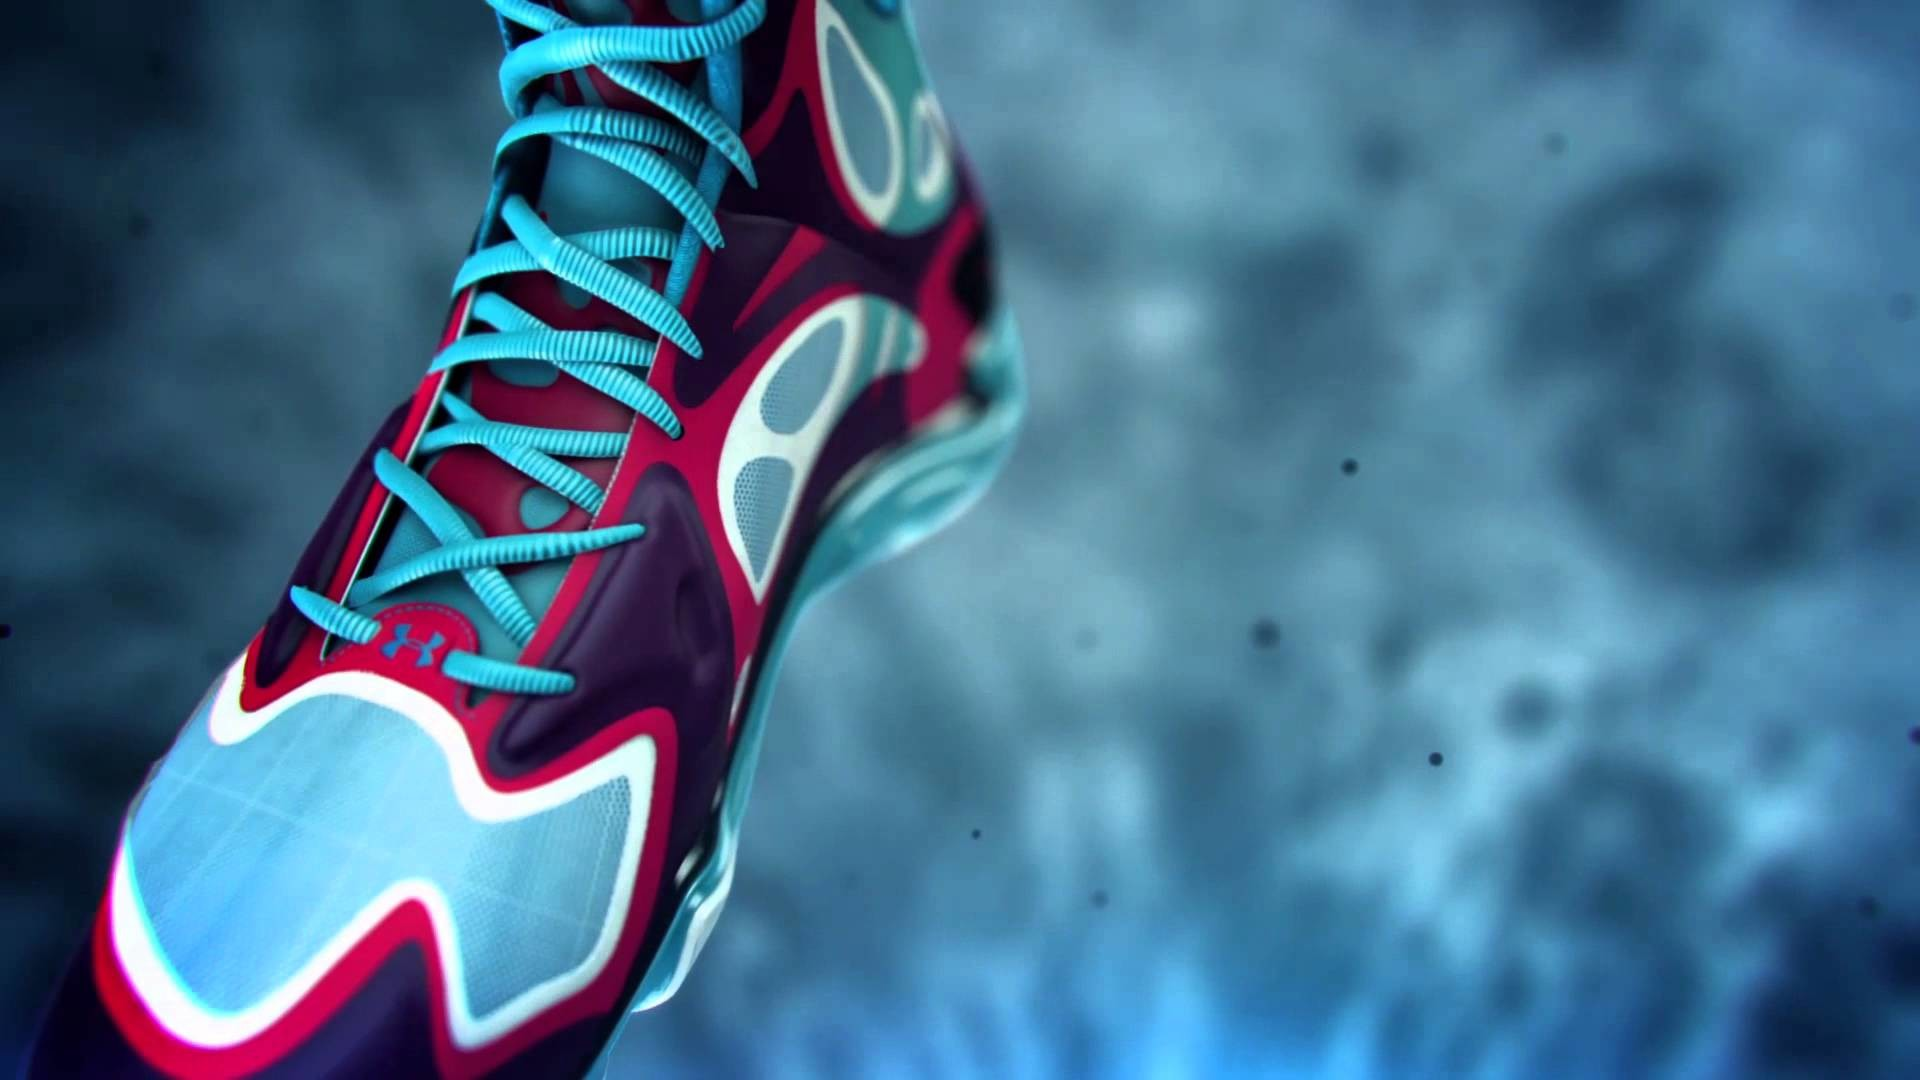 Stephen Curry Under Armour Shoes   DiyMid.com